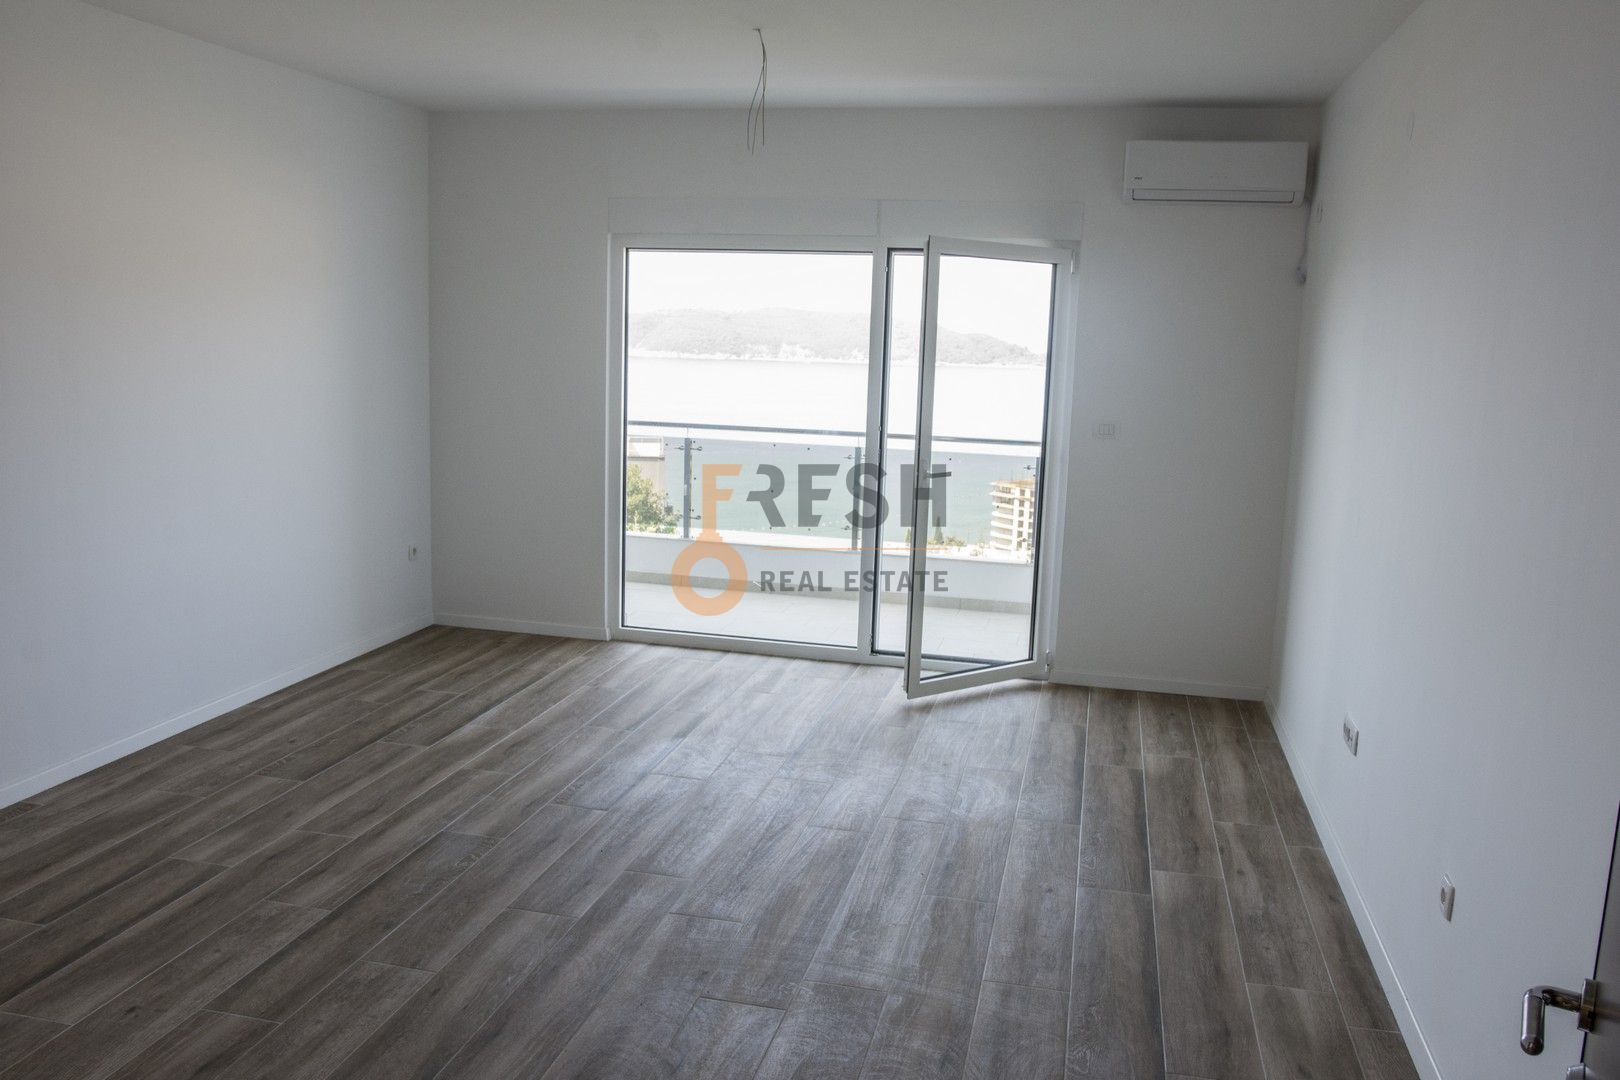 Studio apartnan - garsonjera, 35m2, Rafailovići, Prodaja - 2